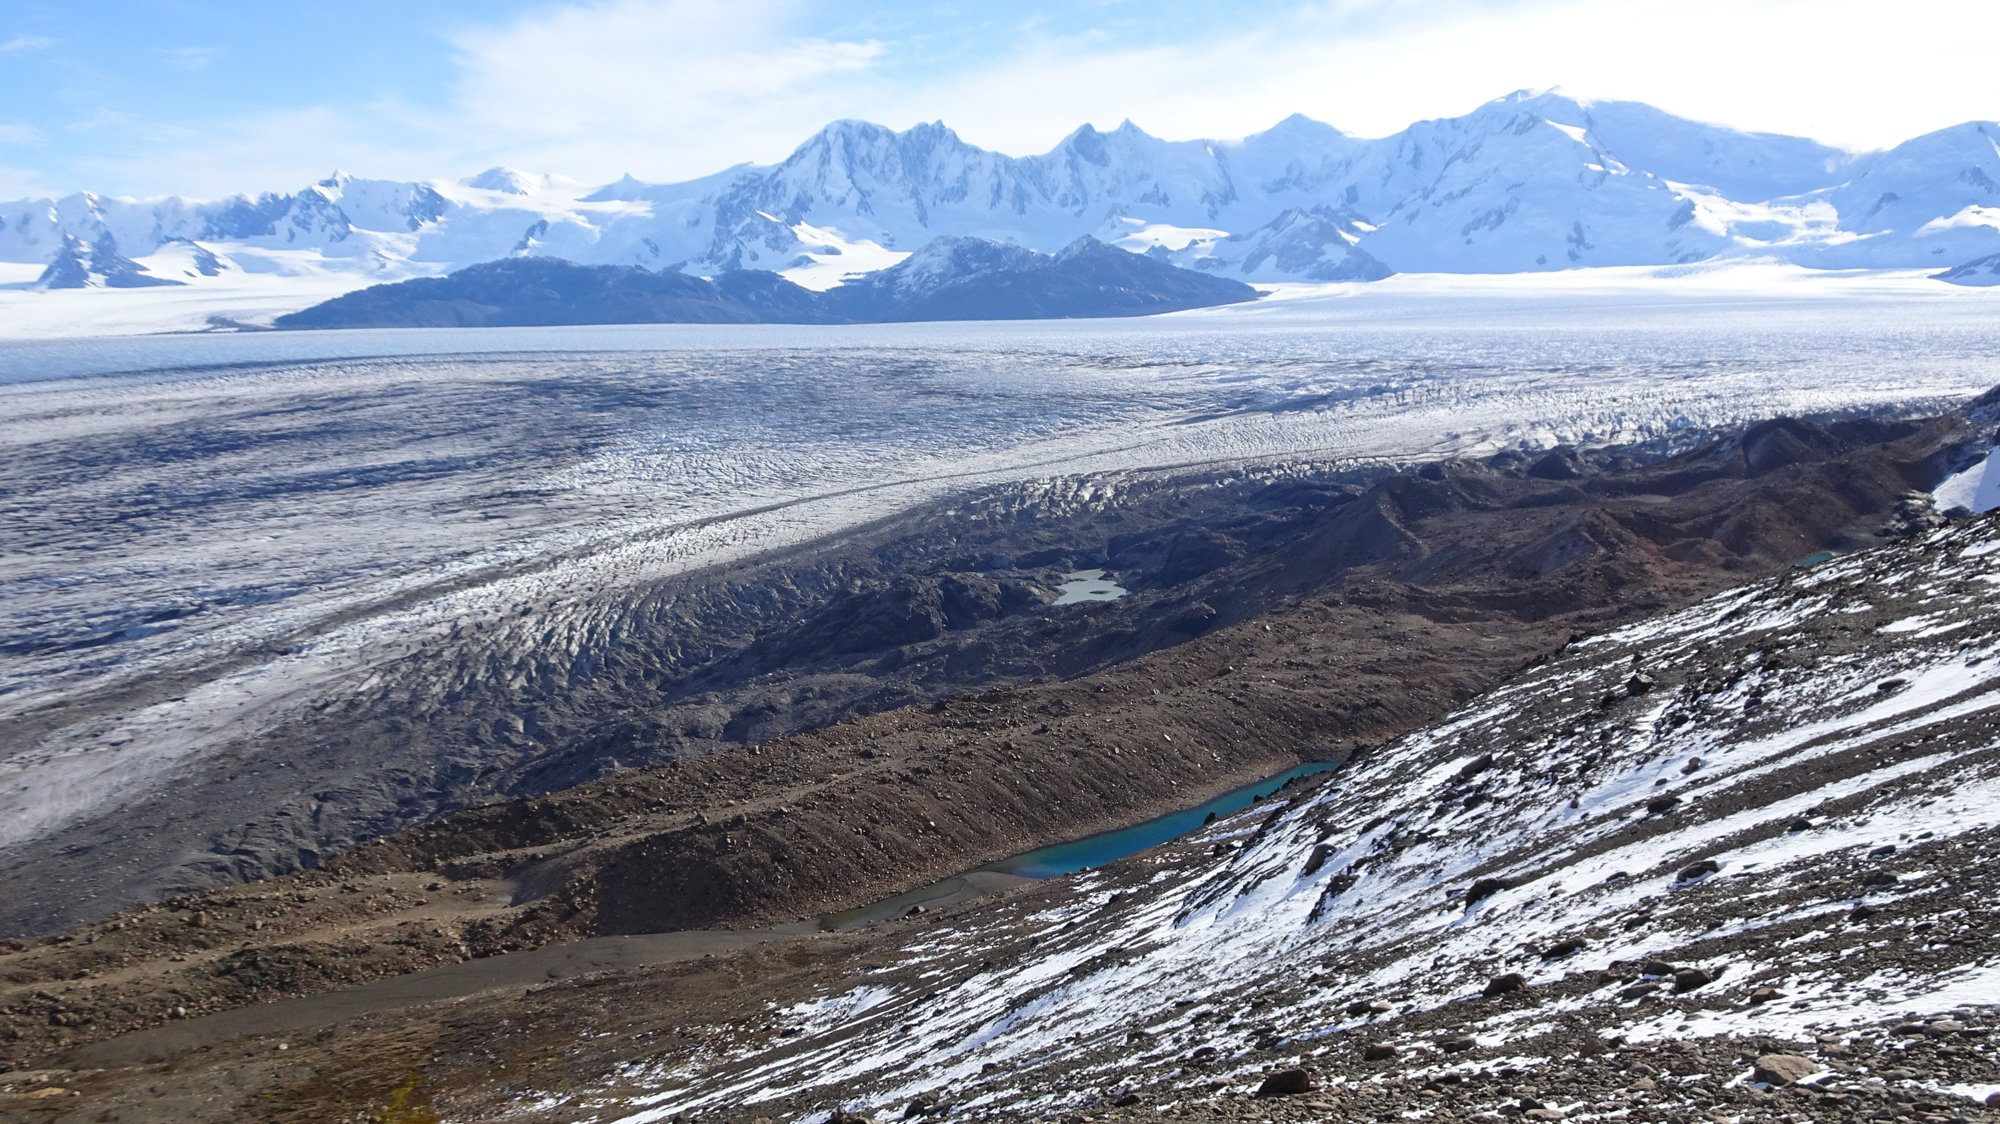 Viedma Gletscher, Huemul Circuit, El Chaltén, Patagonien, Argentinien, Wanderung, Trekking